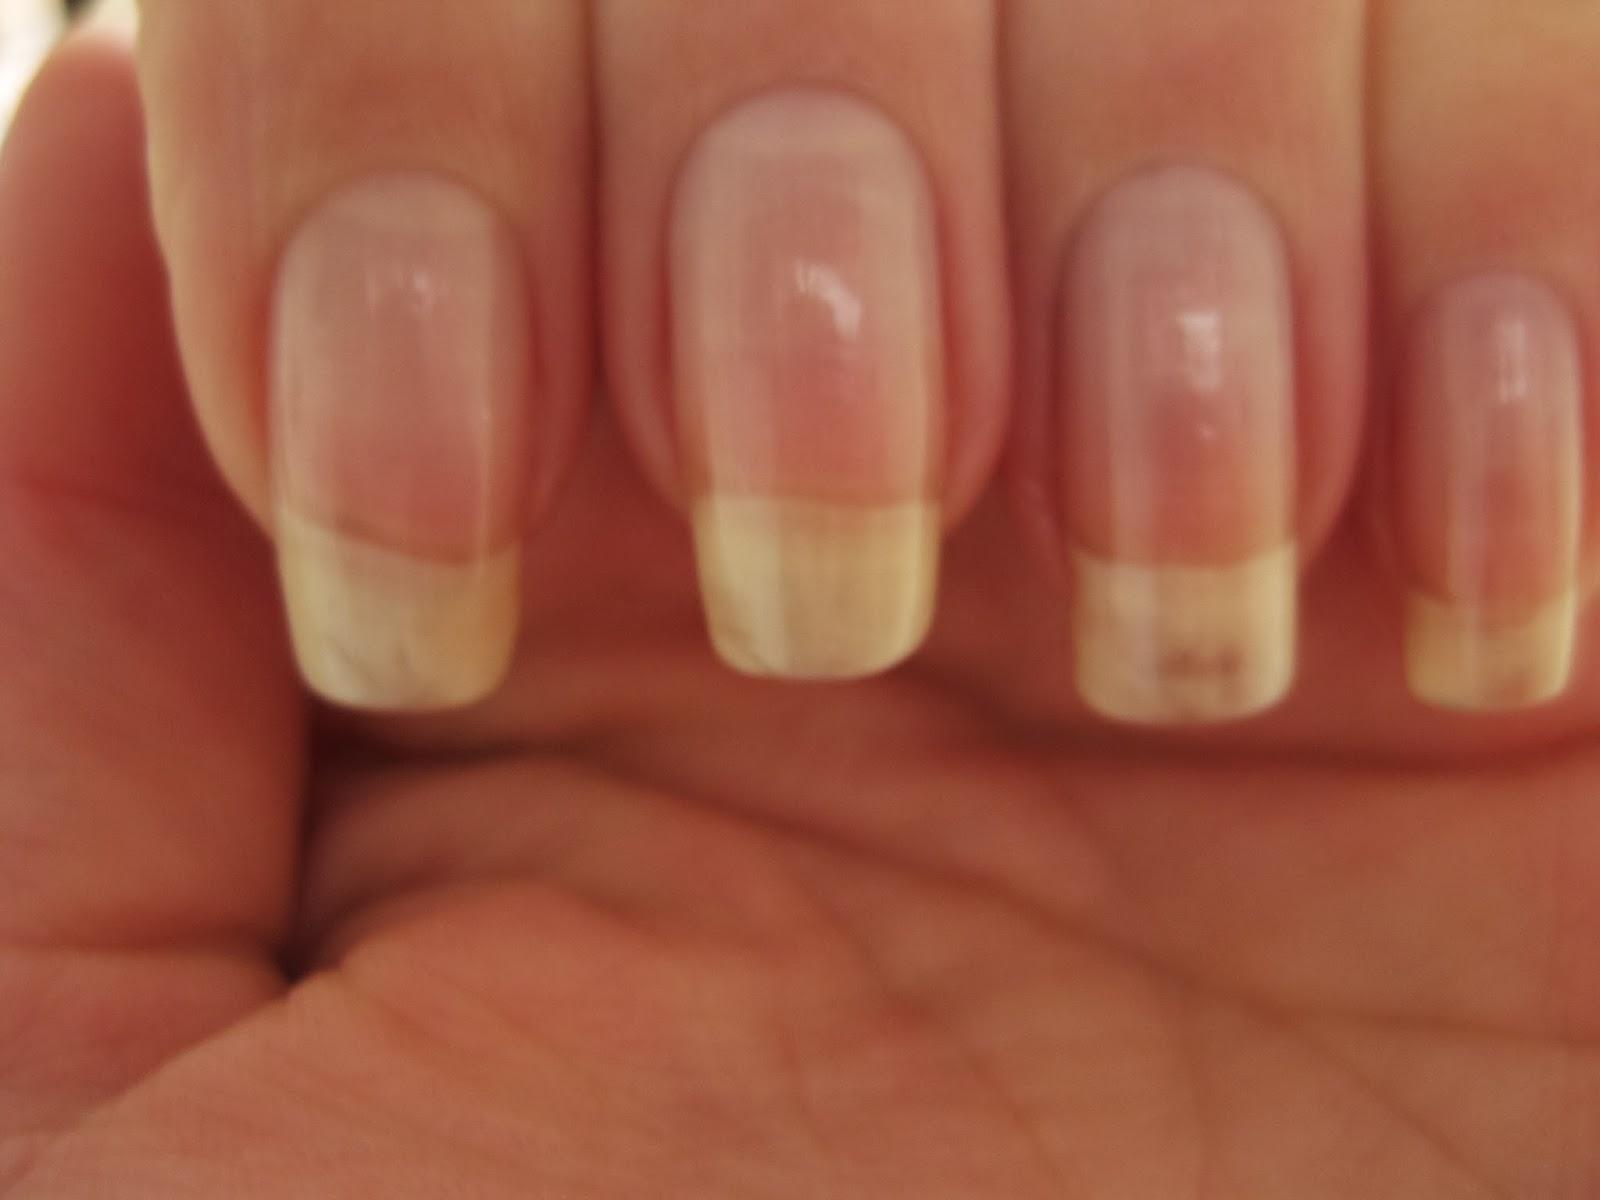 Health Body Nails & Fun: Nails ~ Wijzigen nagelvorm (nail ... Almond Nagels